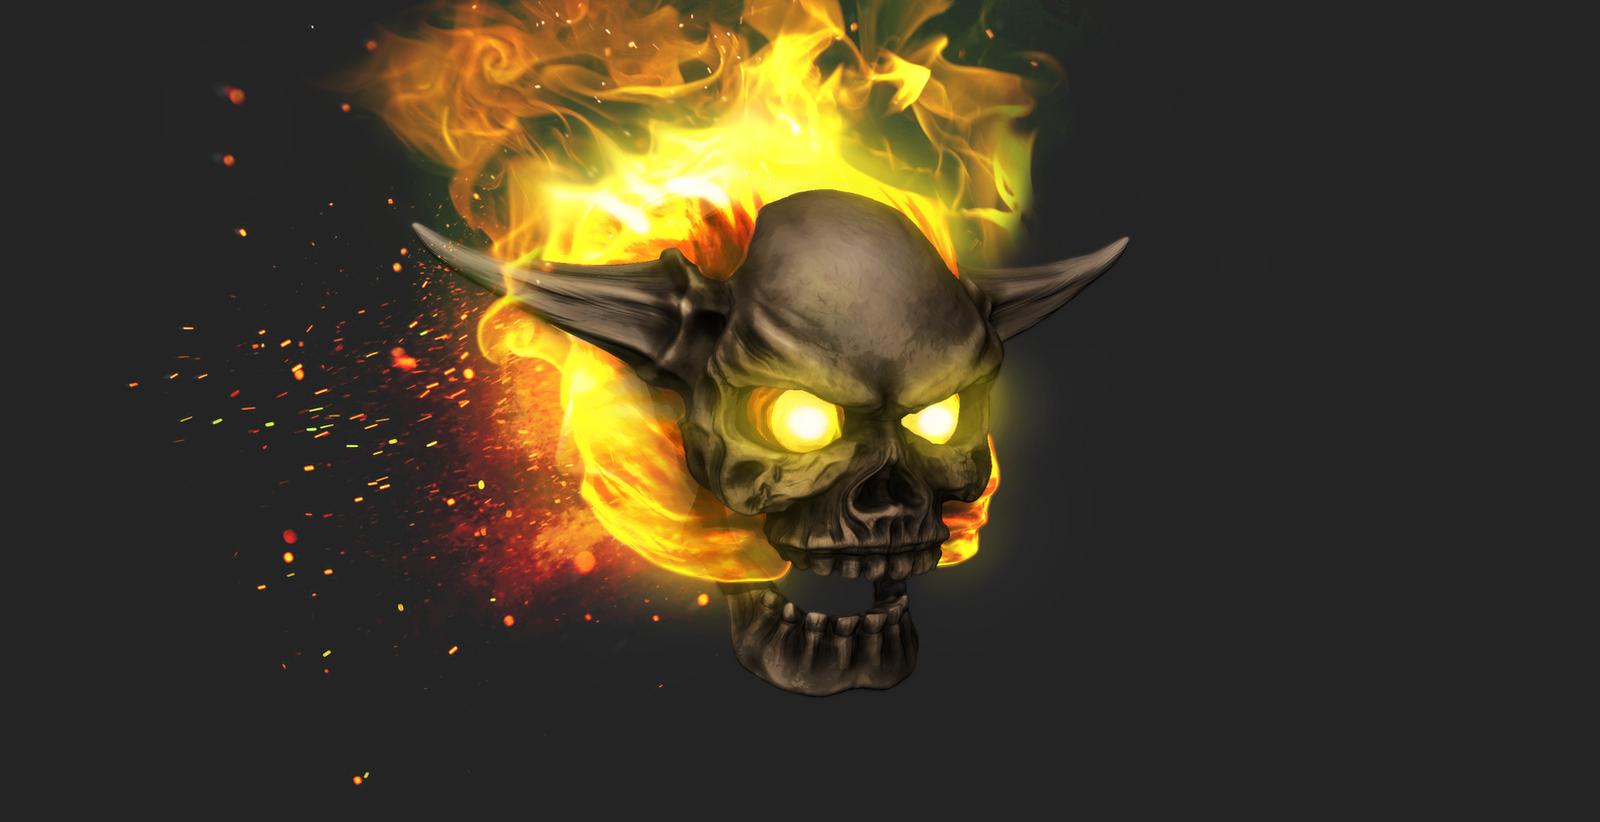 Lost Soul Doom Deviantart: Doom Lost Soul Mudbox Render PS Edit By S13n1 On DeviantArt